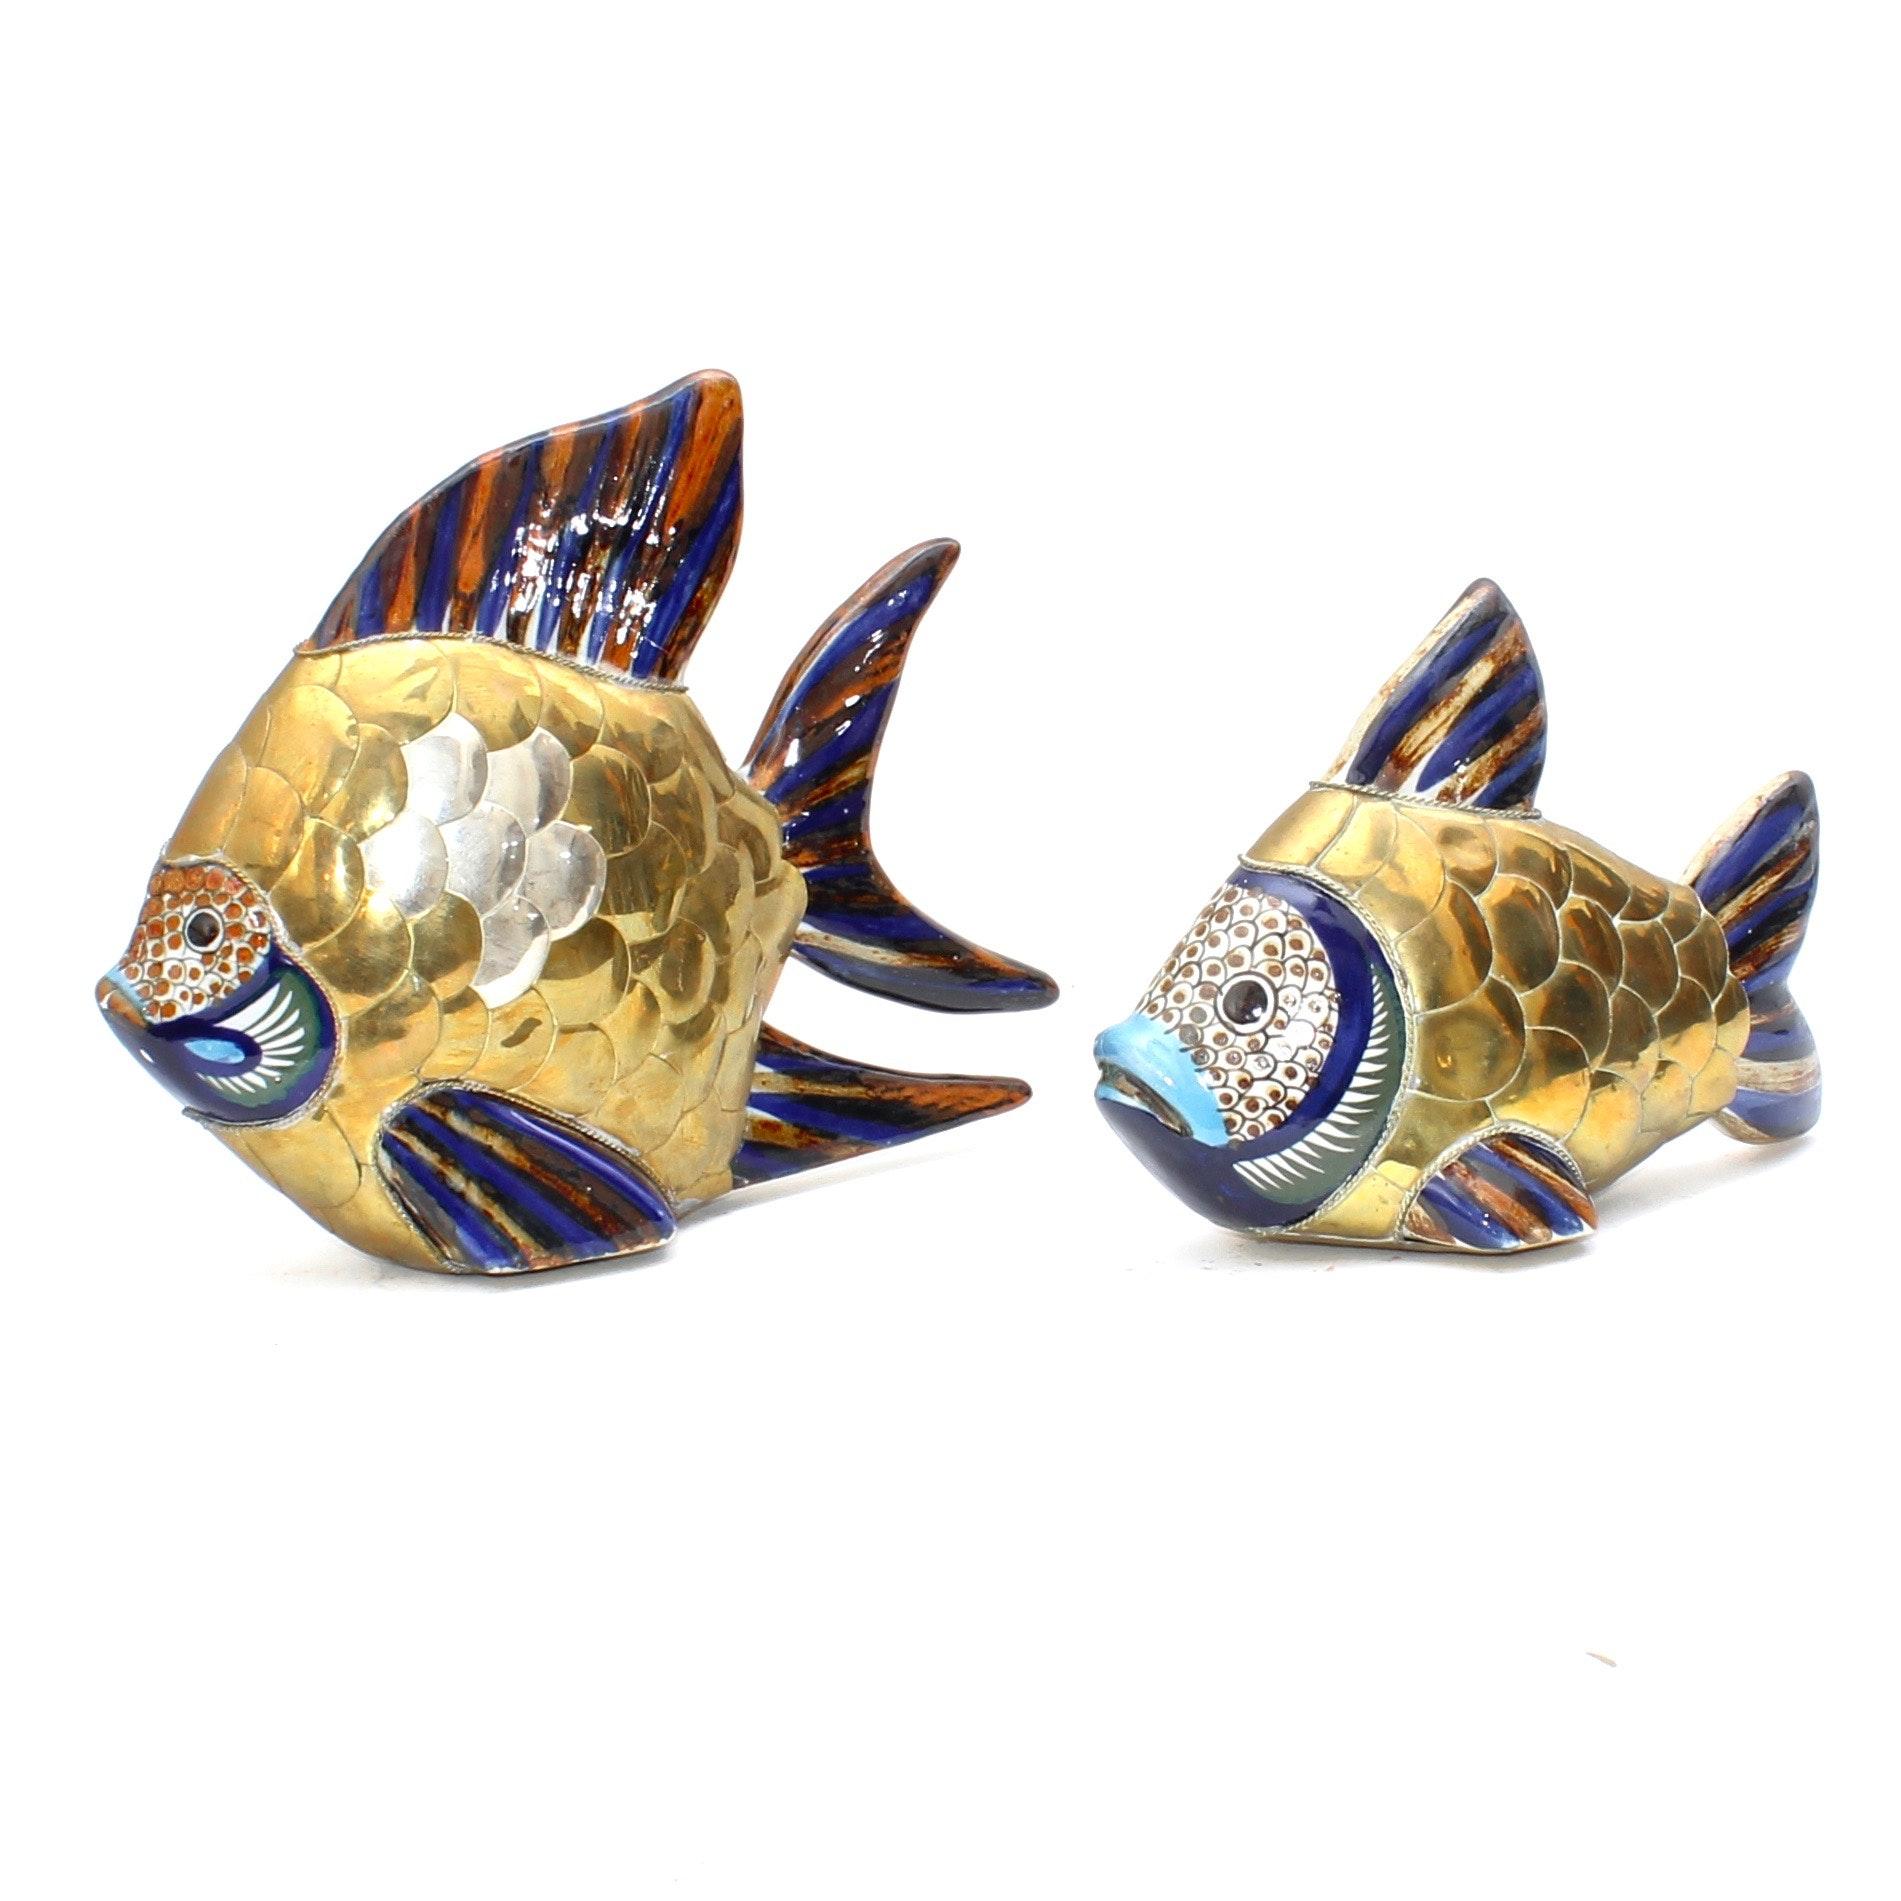 Sergio Bustamante Brass, Copper and Ceramic Fish Sculptures